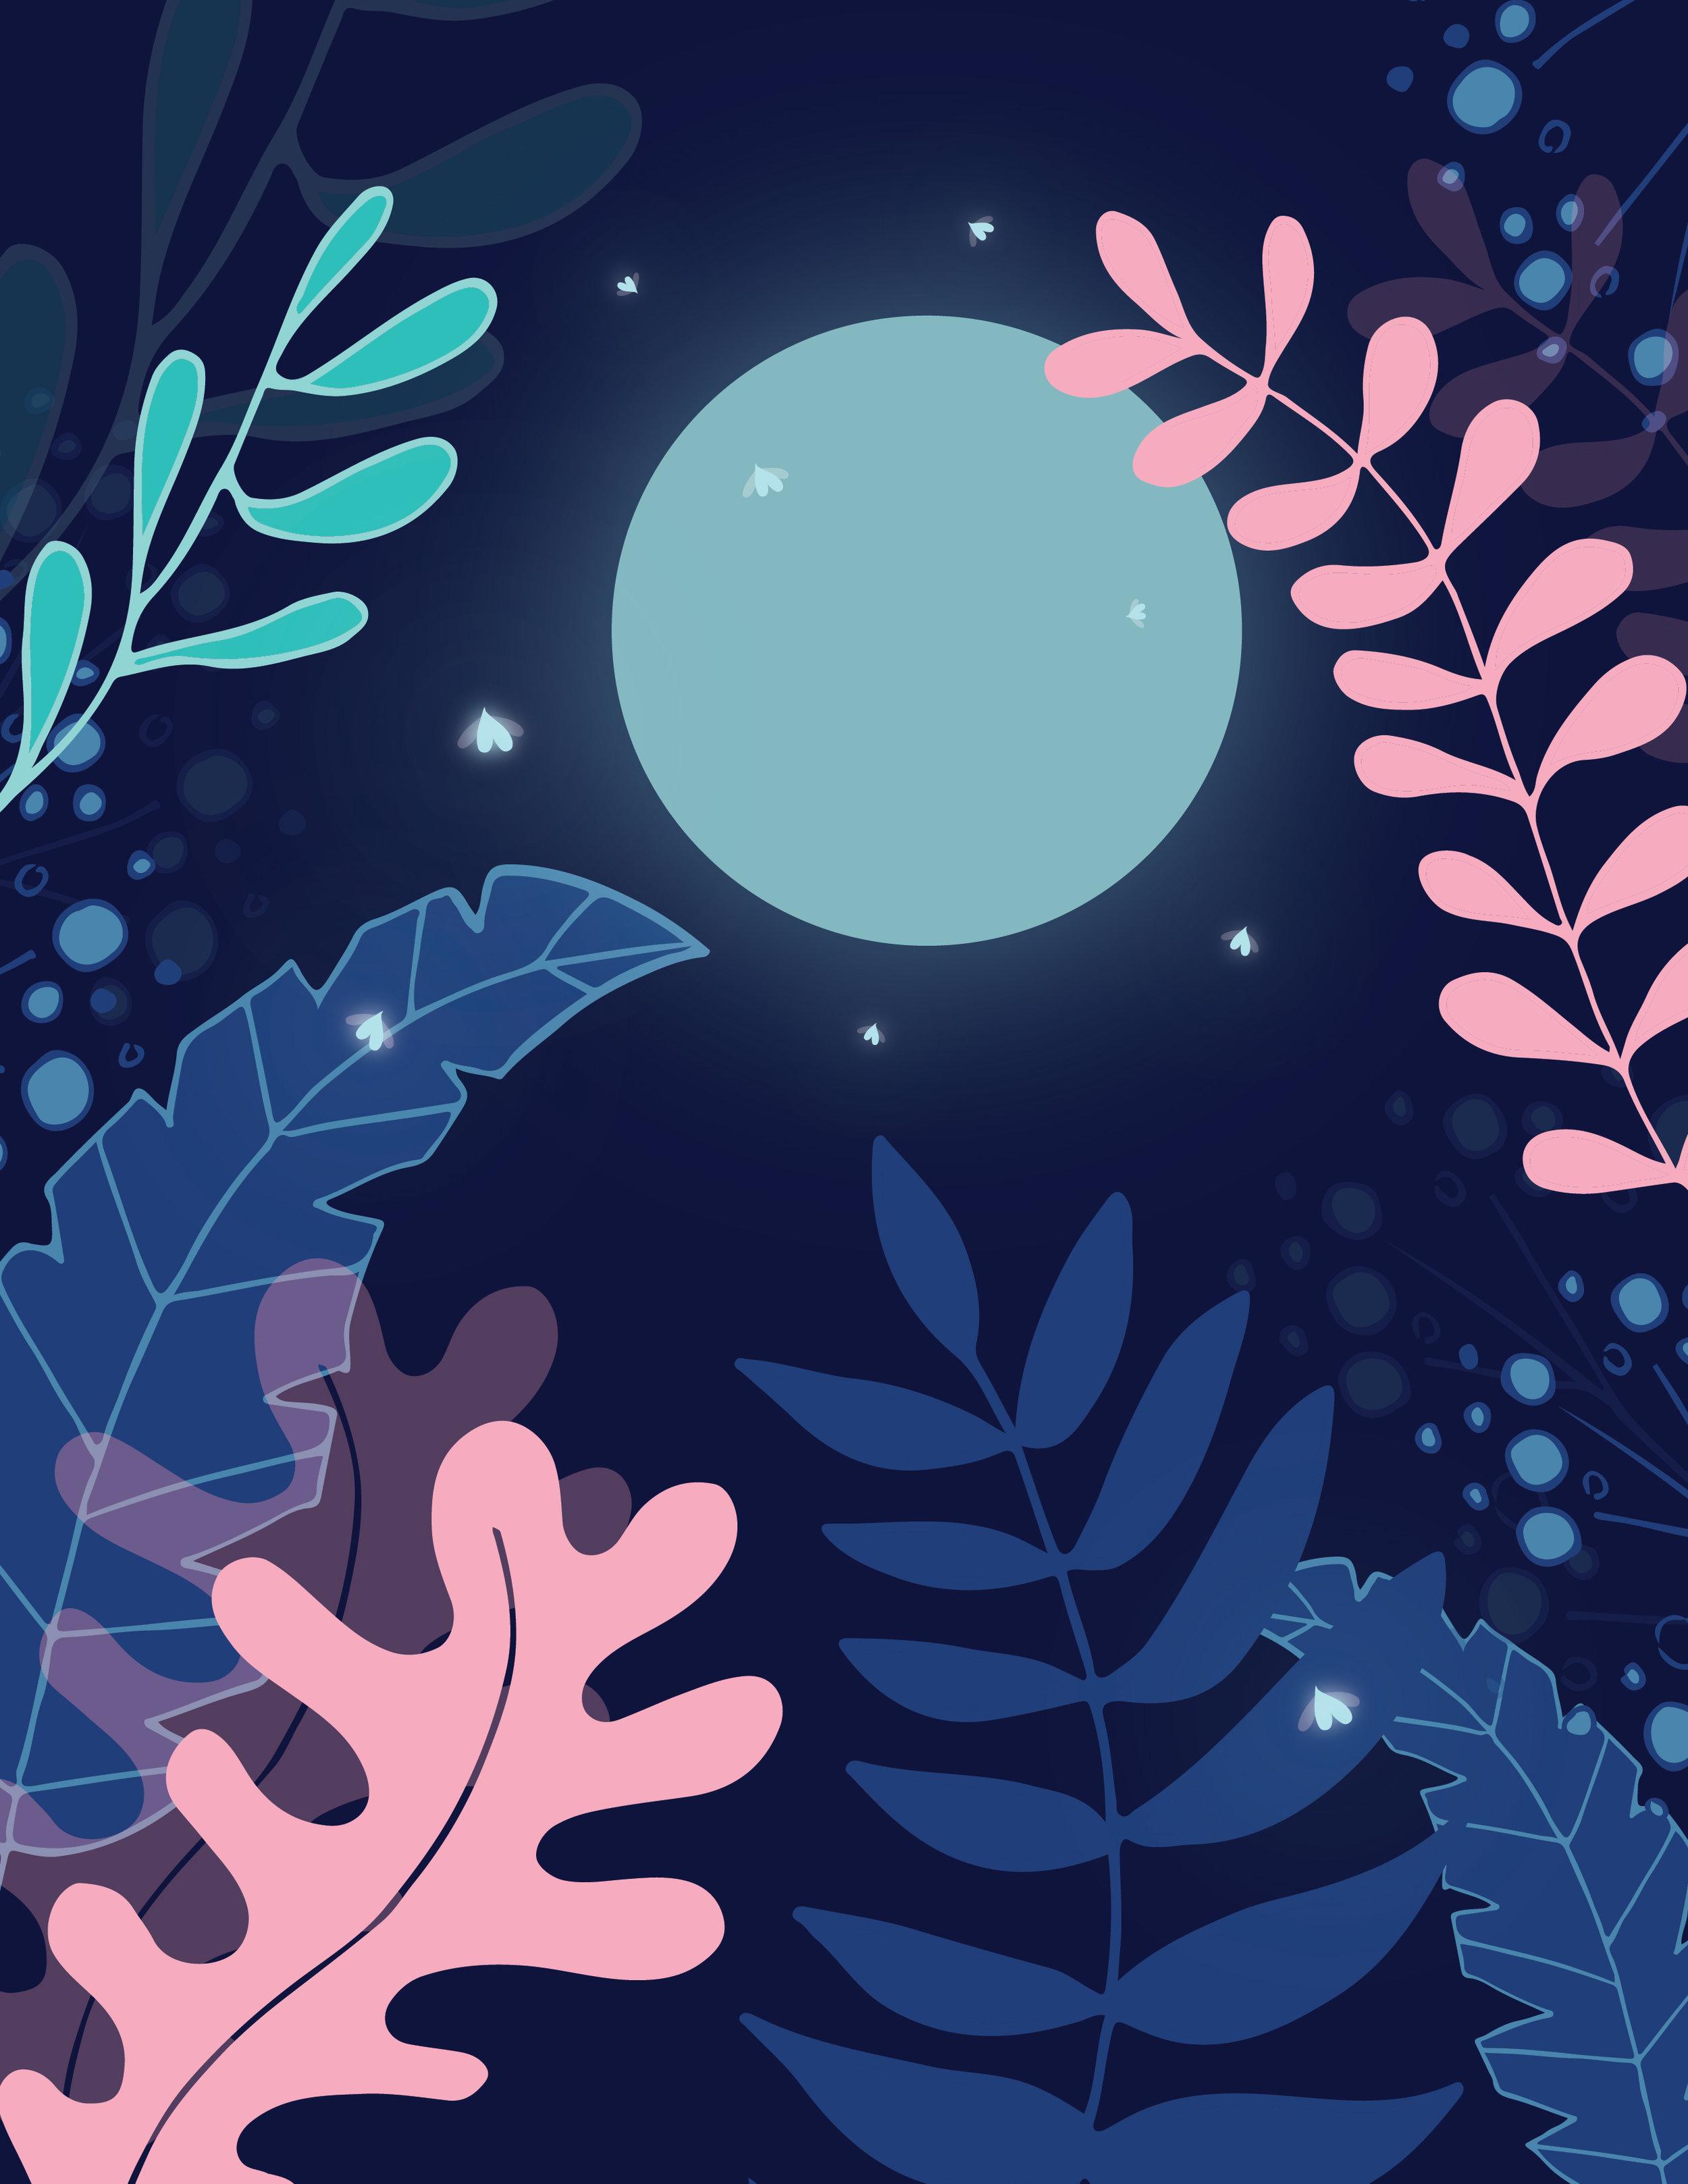 Night Flowers-01.jpg